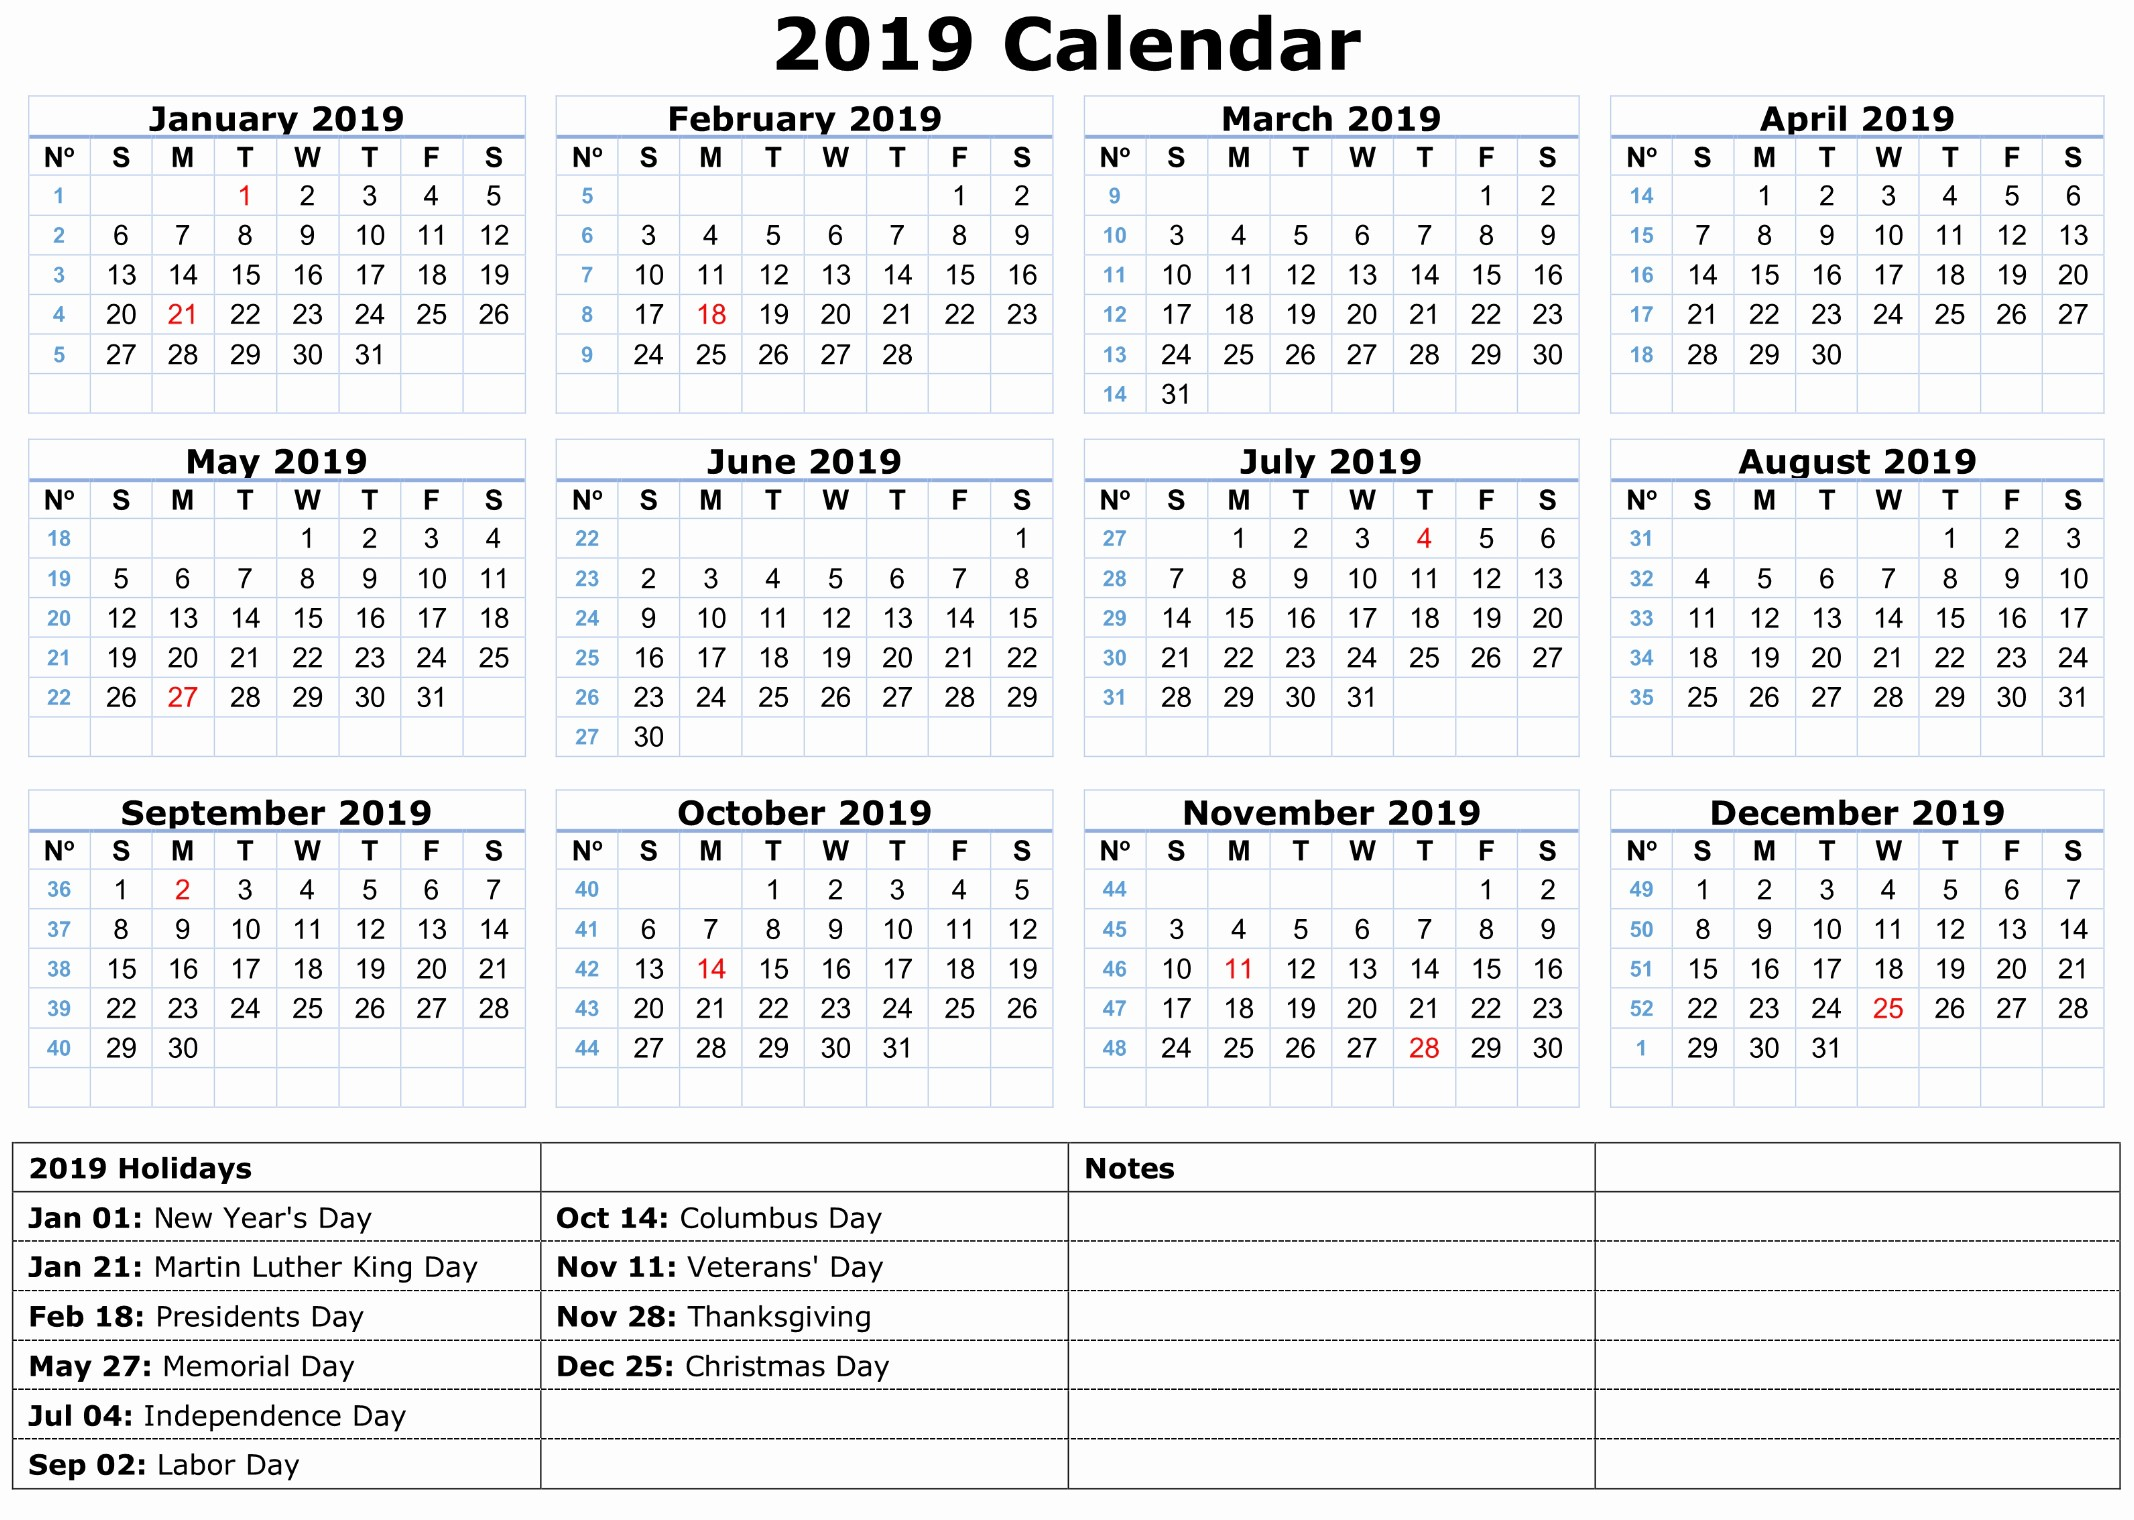 Calendar 2019 Christian Holidays Calendar Más Reciente Printable Calendar 2019 Pdf India 2019 Calendar with Indian Holidays Of Calendar 2019 Christian Holidays Calendar Más Arriba-a-fecha Free Printable Australia Calendar 2020 In Pdf Excel & Word format